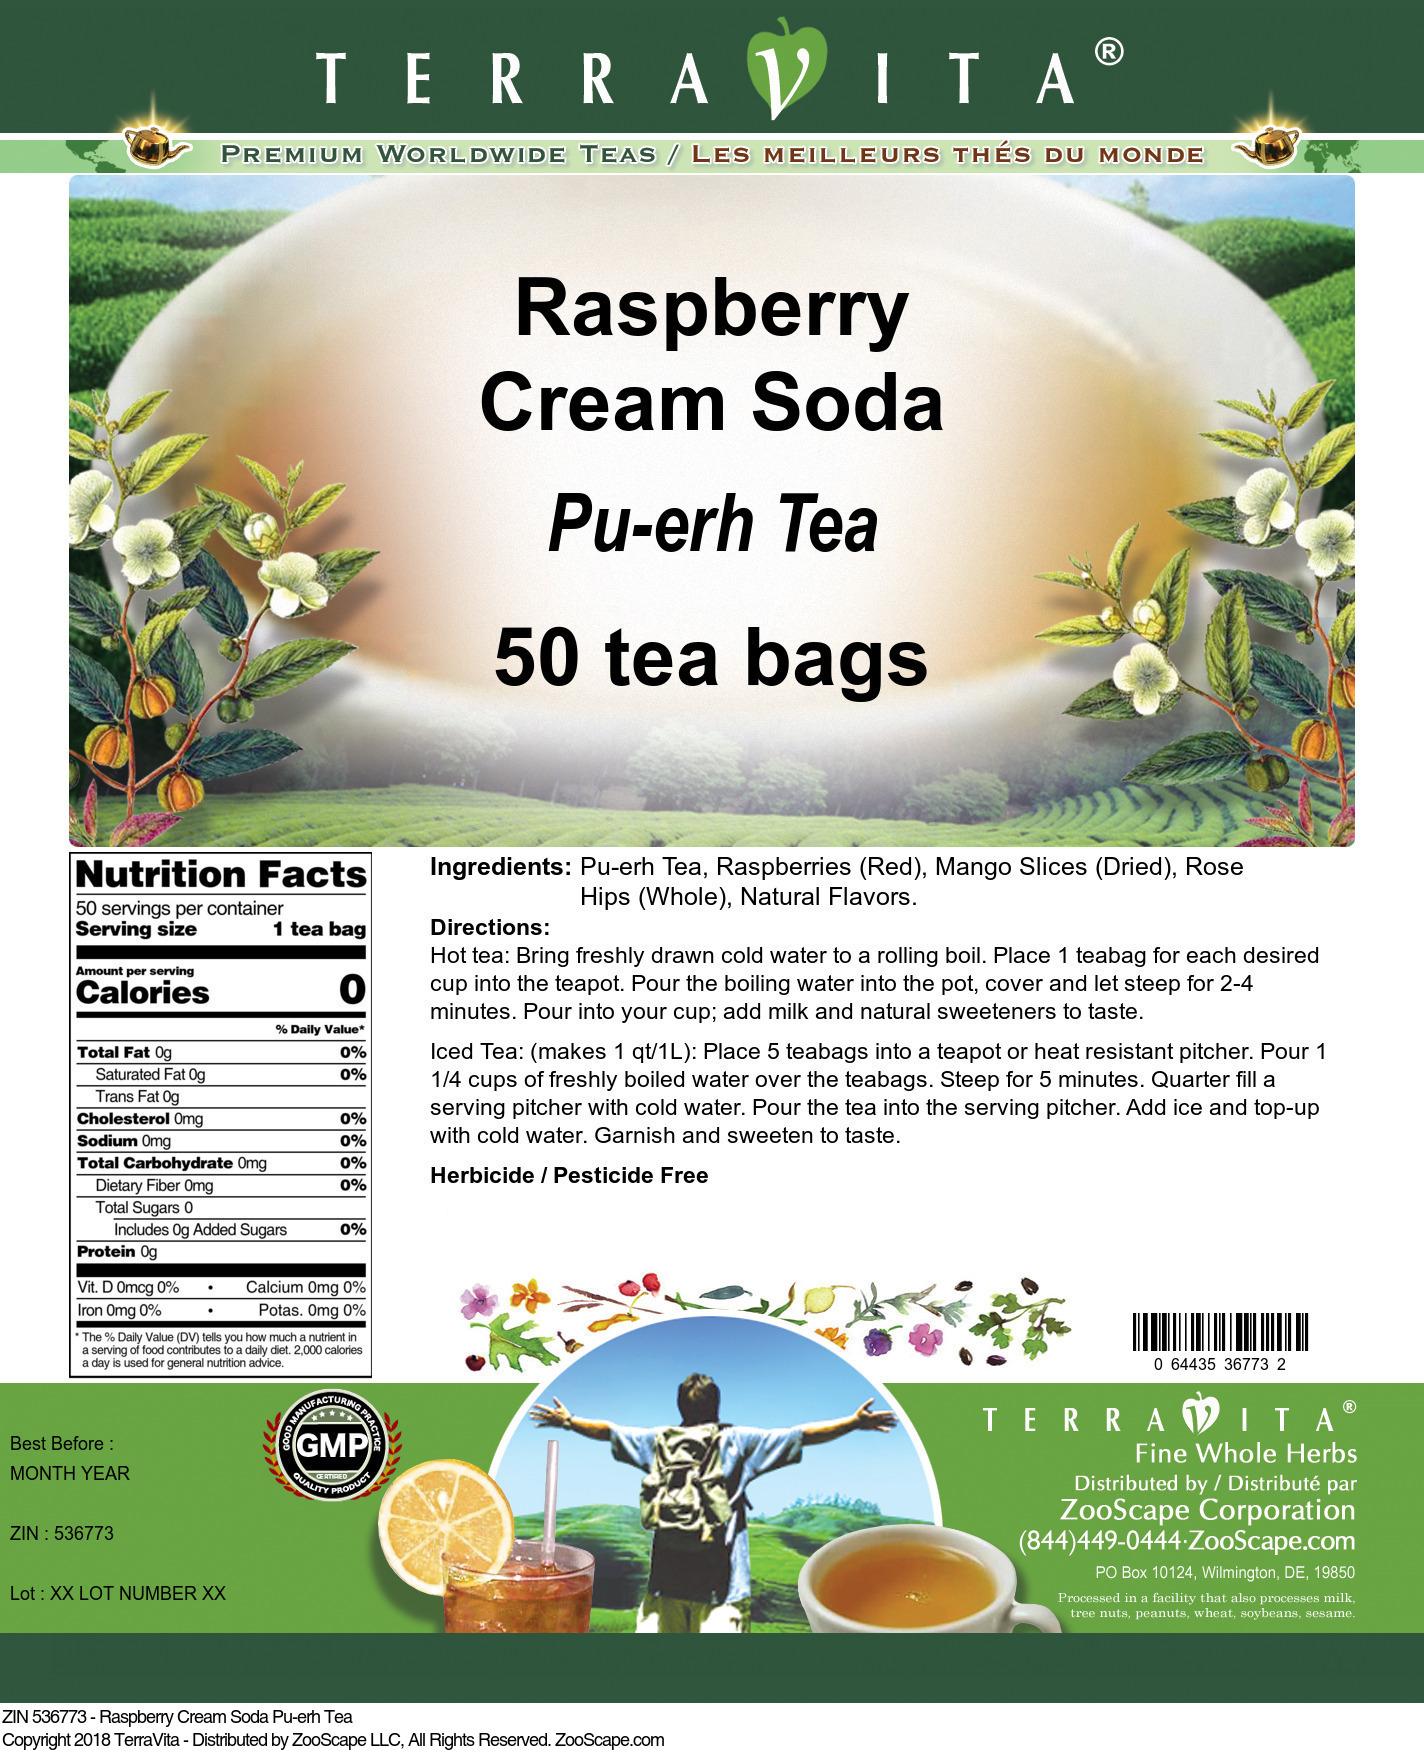 Raspberry Cream Soda Pu-erh Tea